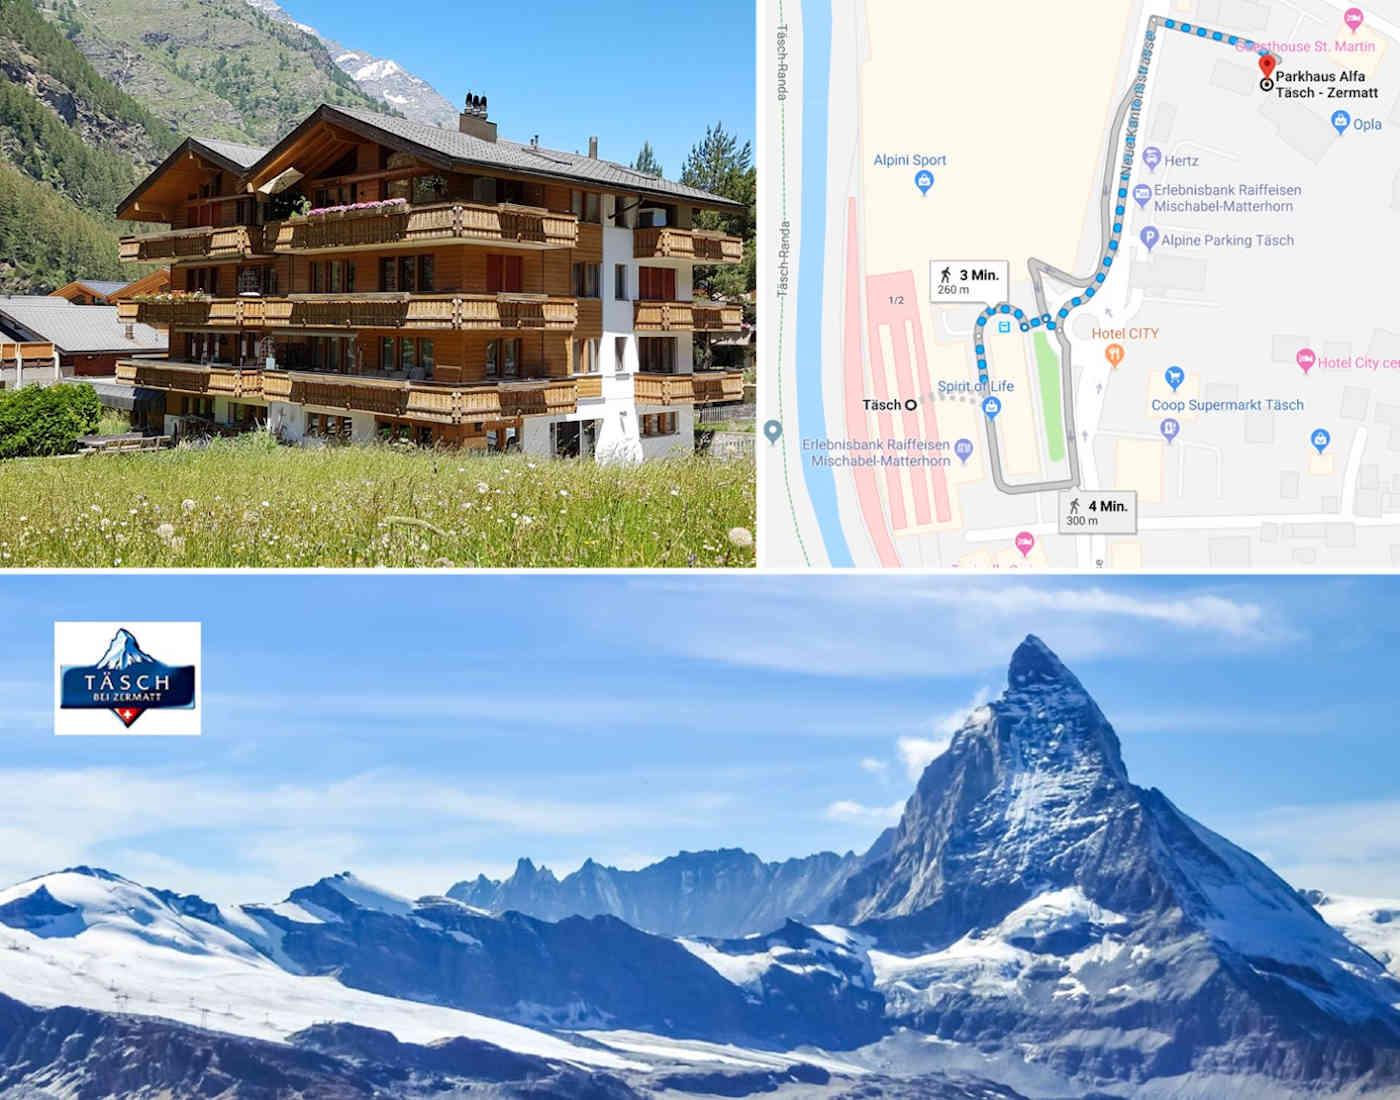 Parkhaus-Zermatt-Parkhaus-Taesch-Parkhaus-Alfa